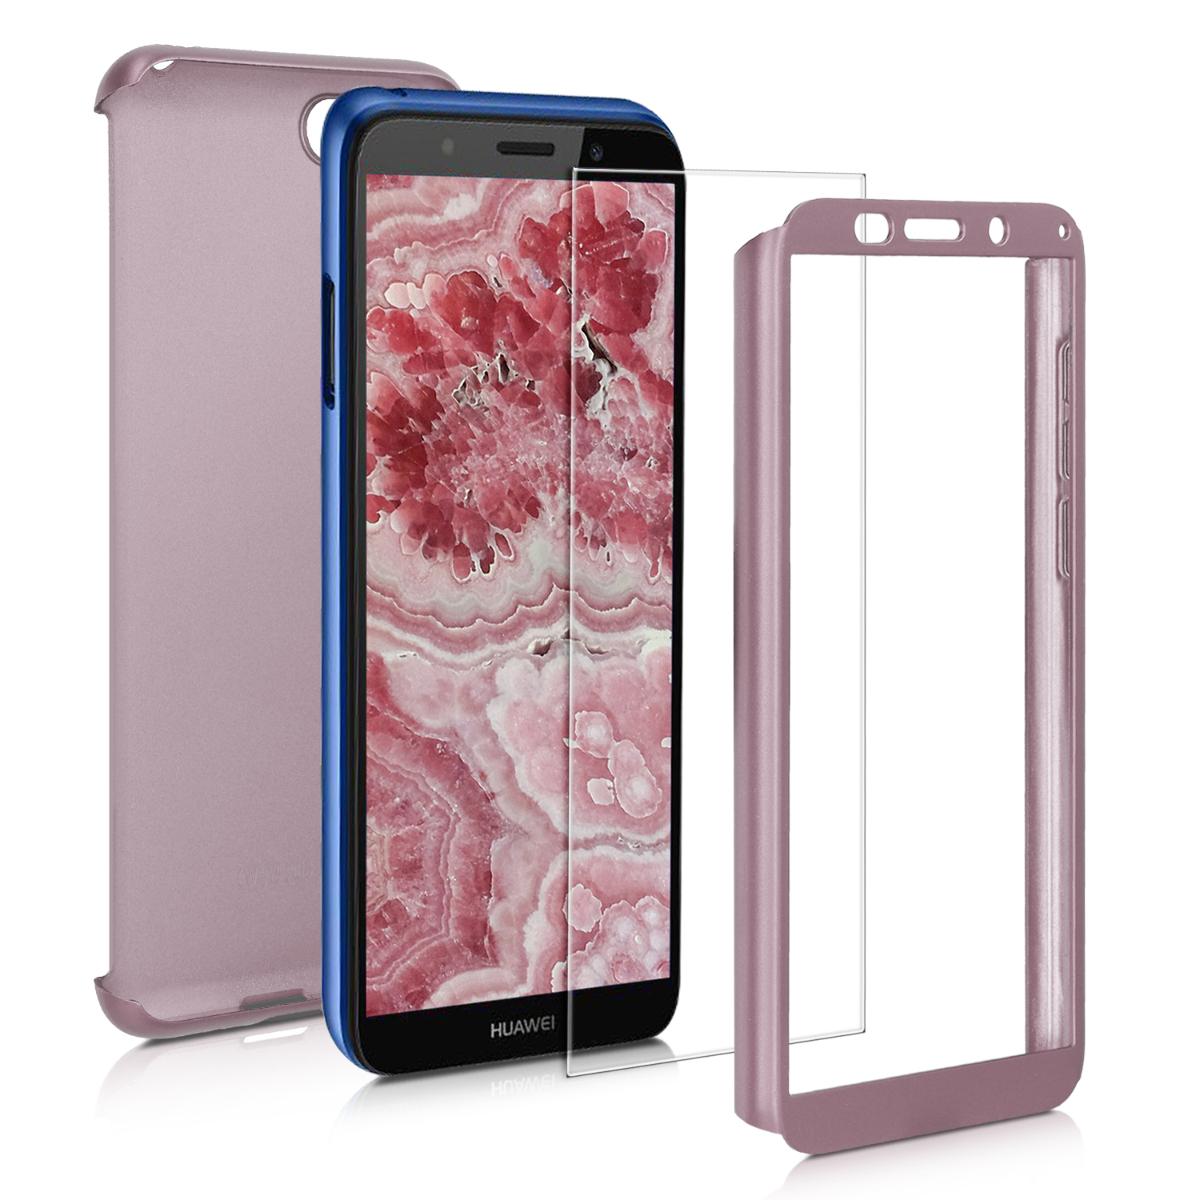 KW Θήκη Full Body Huawei Y5 / Y5 Prime 2018 & Tempered Glass - Metallic Rose Gold (48887.31)